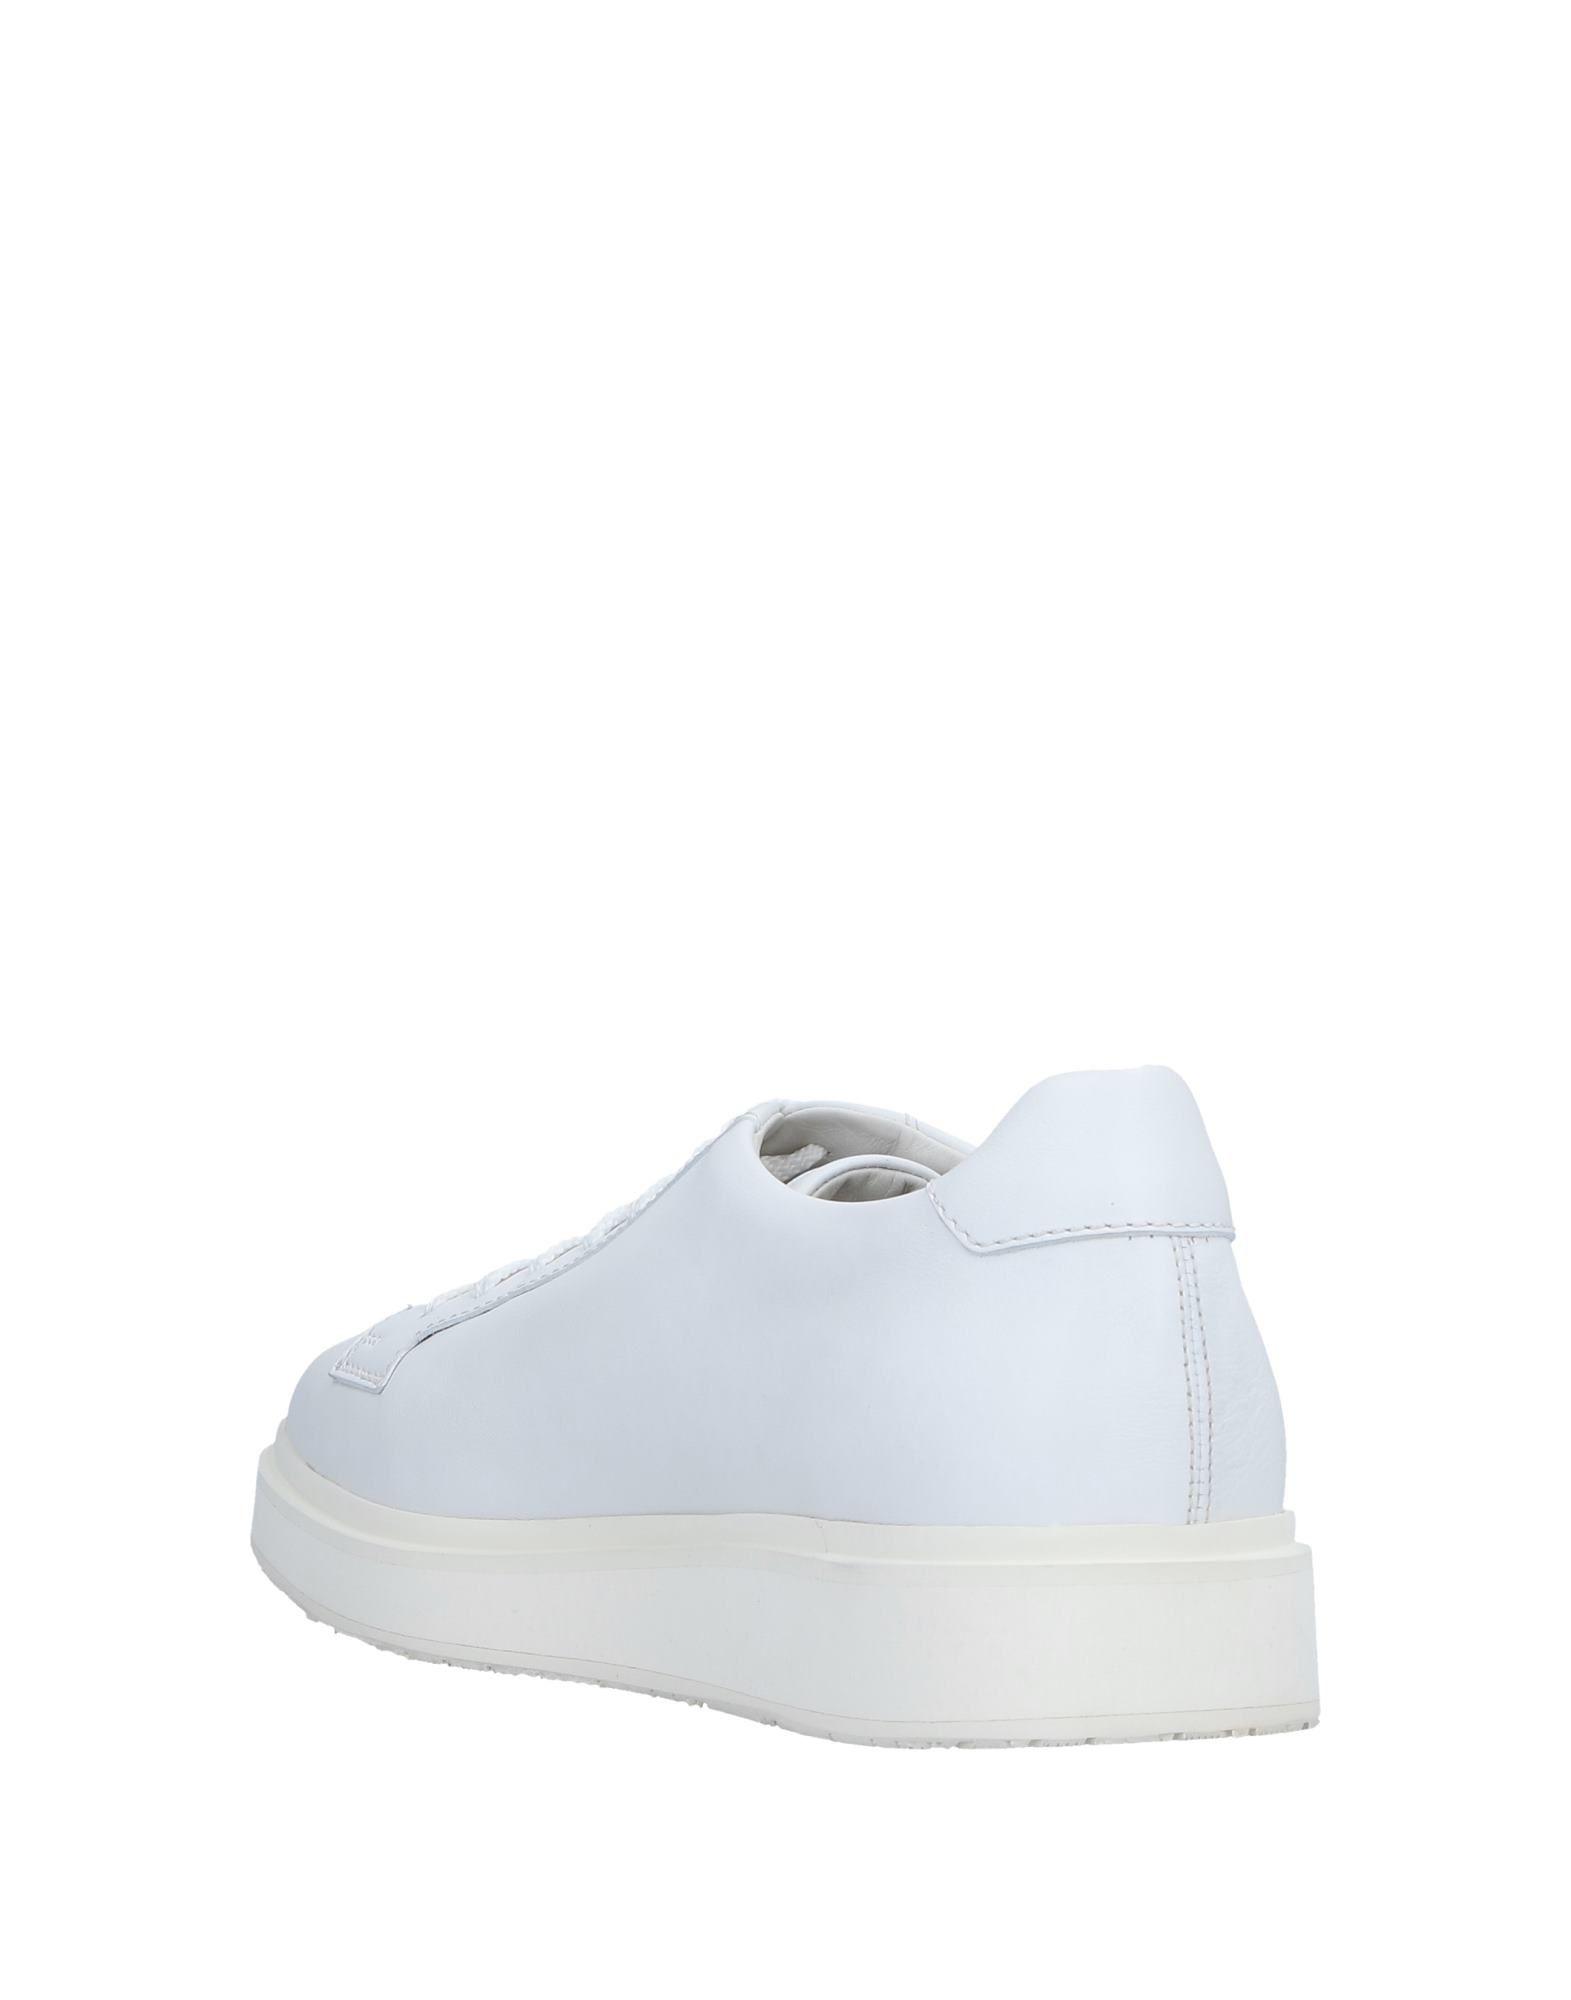 Santoni  Sneakers Herren  11540132WE  Santoni 0159a6